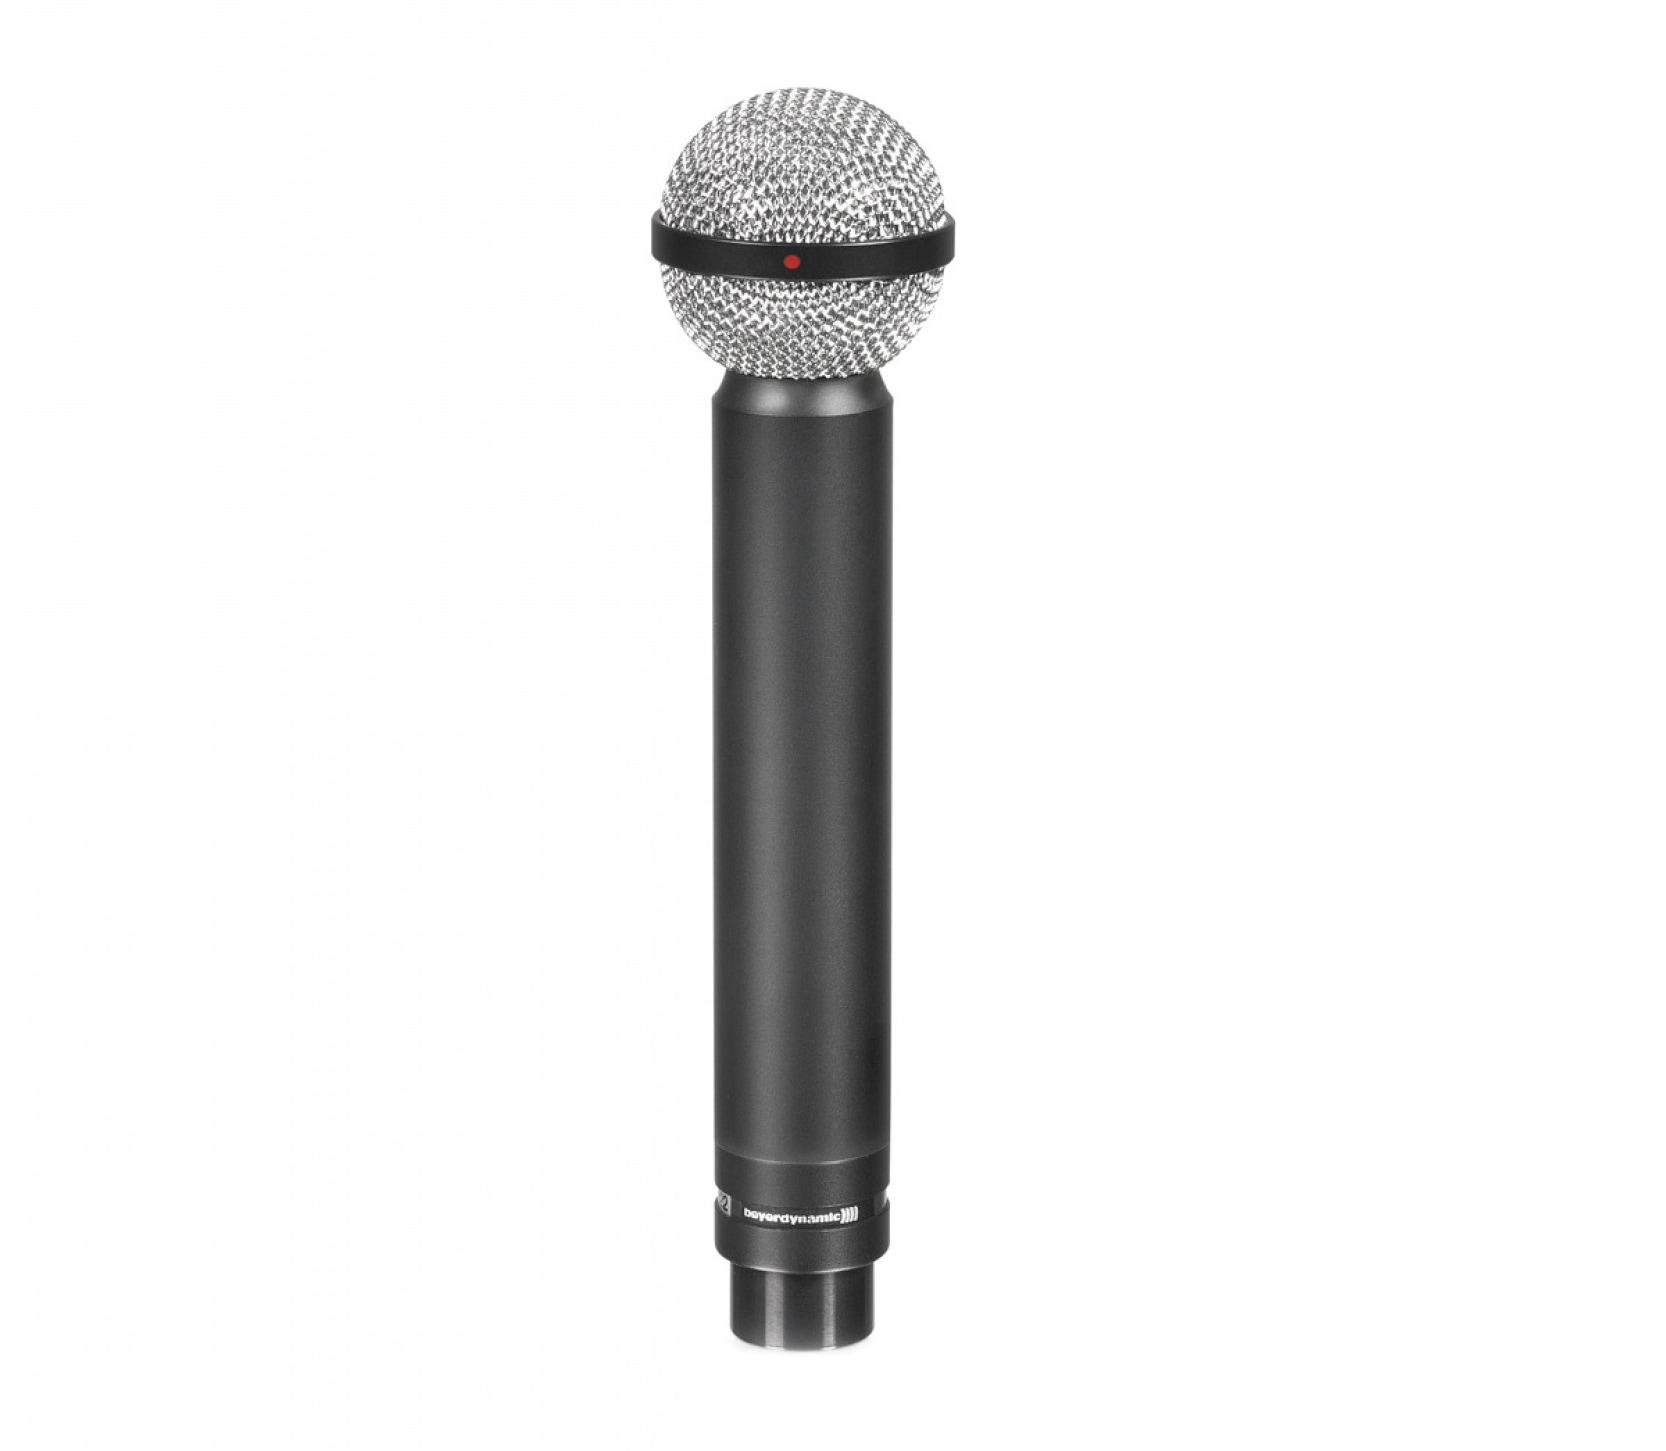 beyerdynamic Bändchenmikrofon M 160 - blog